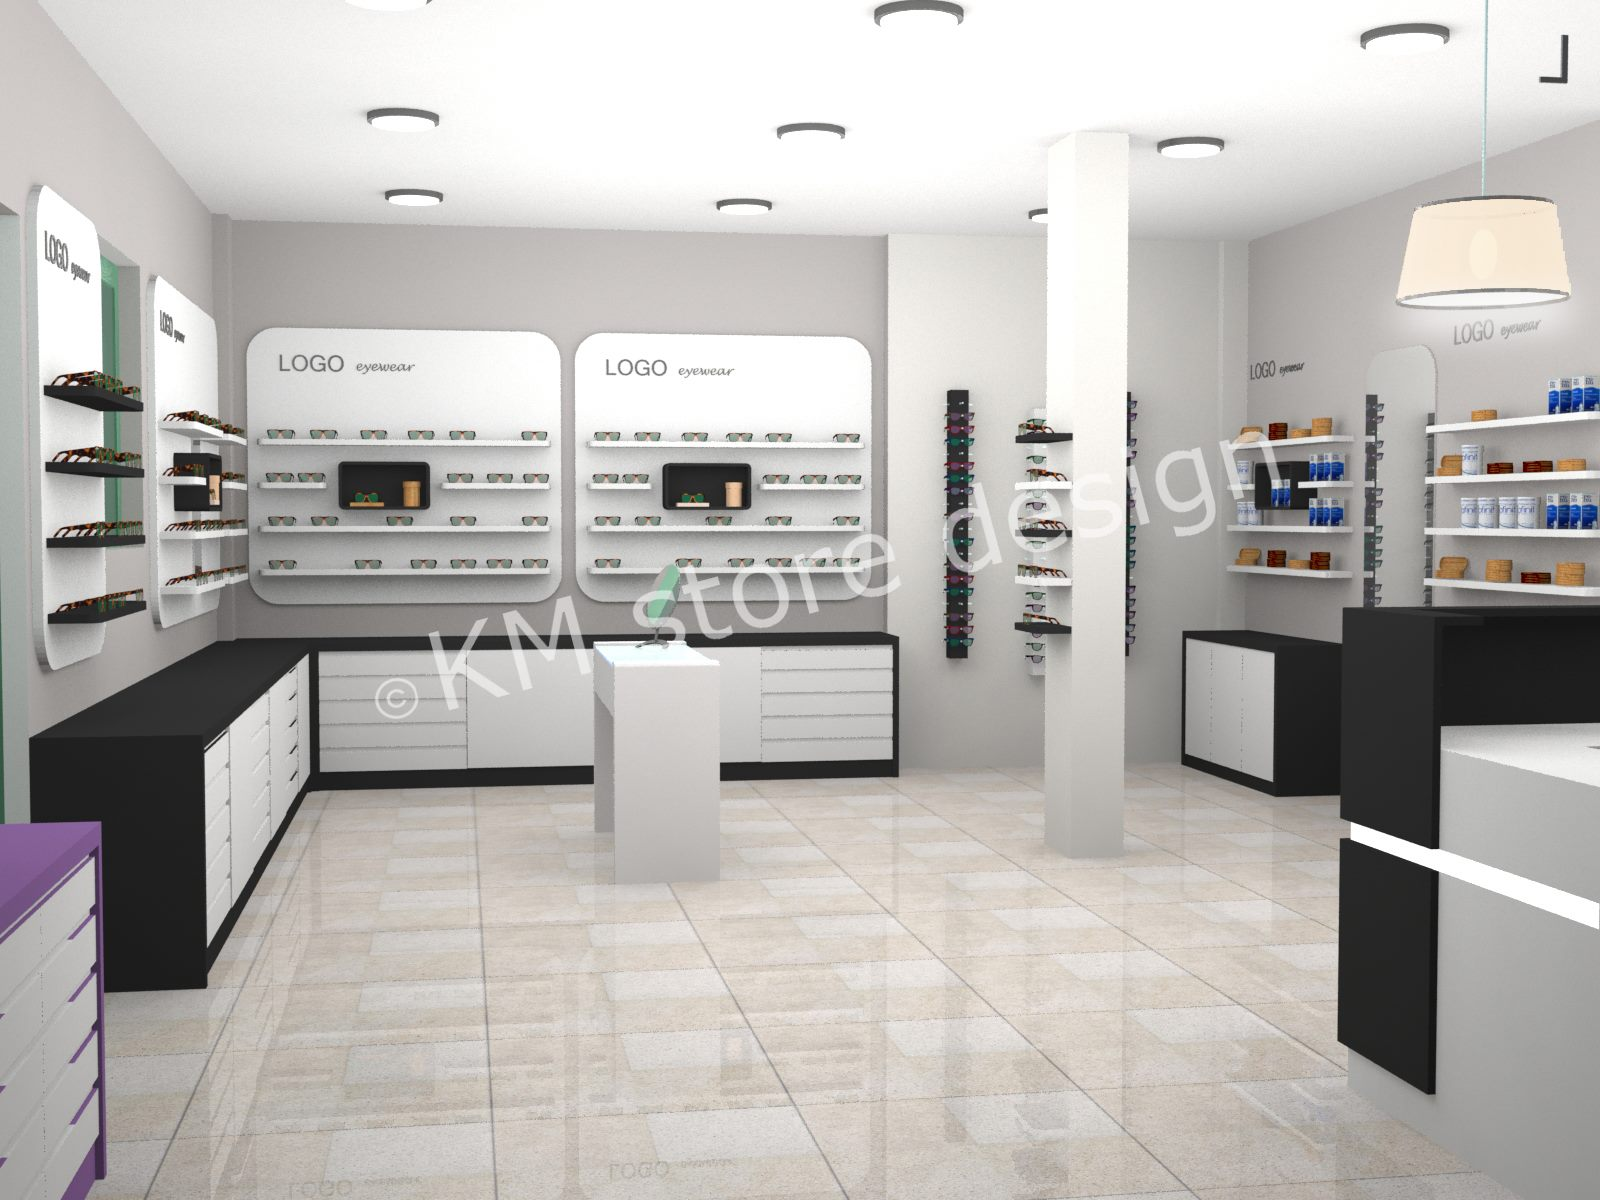 69e0a46c67 Εξοπλισμός οπτικών καταστημάτων - KM store design